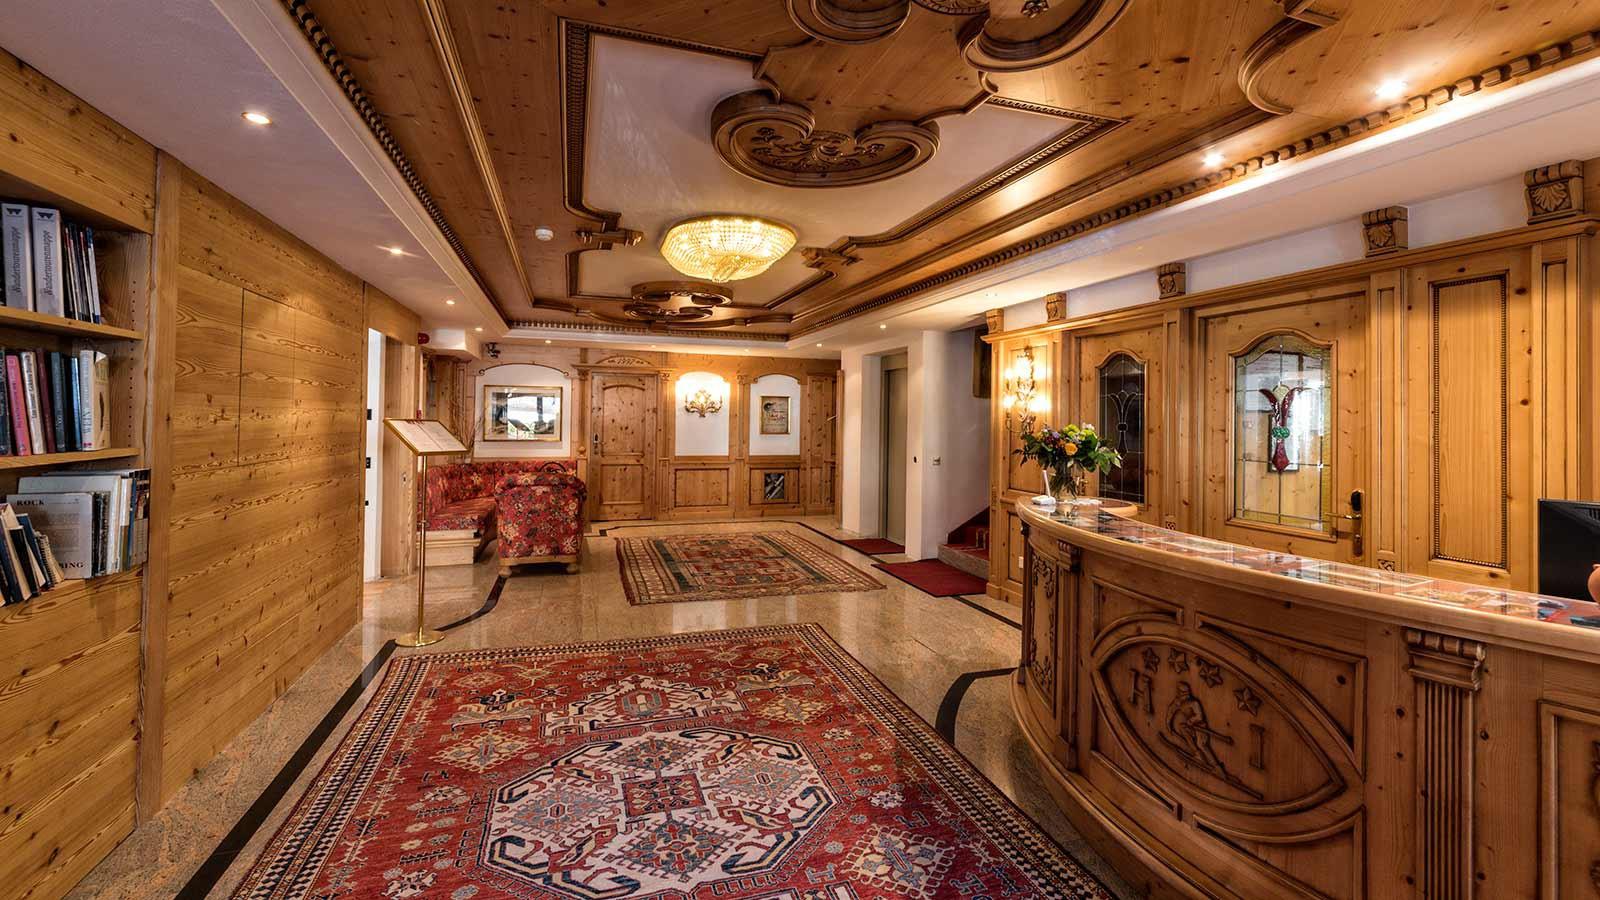 Reception- Hotel Interski, Selva Val Gardena, Italy